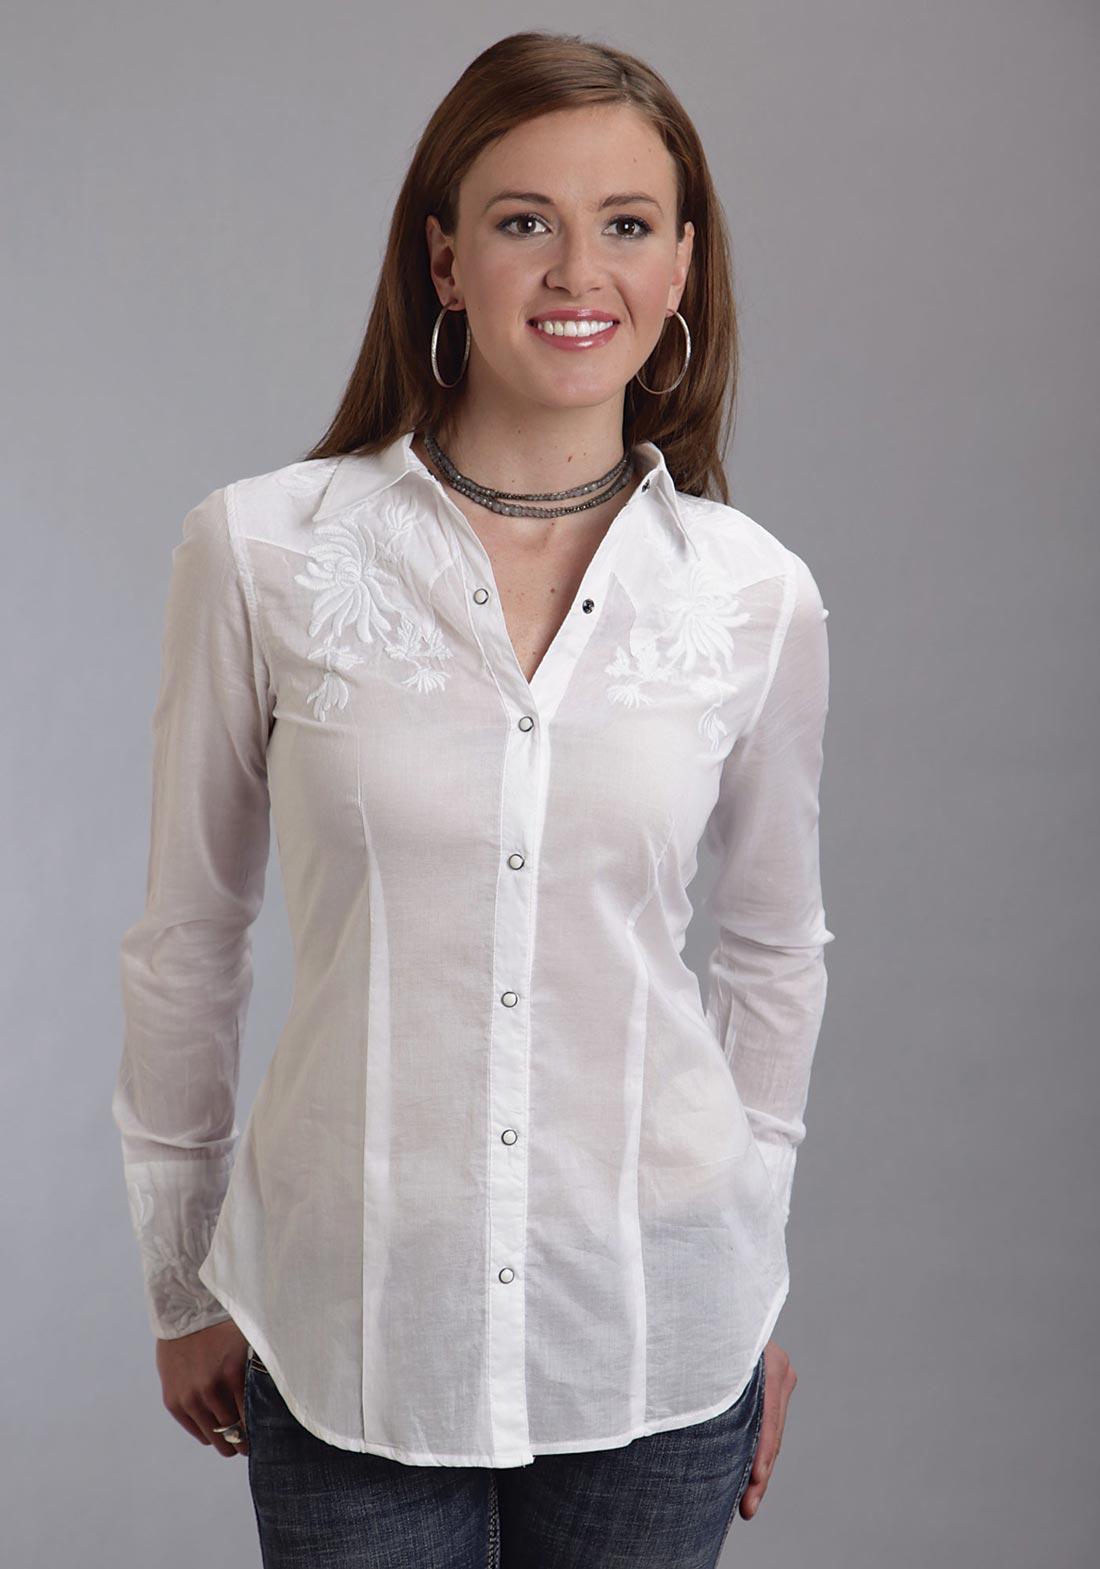 Stetson women 39 s white voile long sleeve shirt for White shirt for ladies